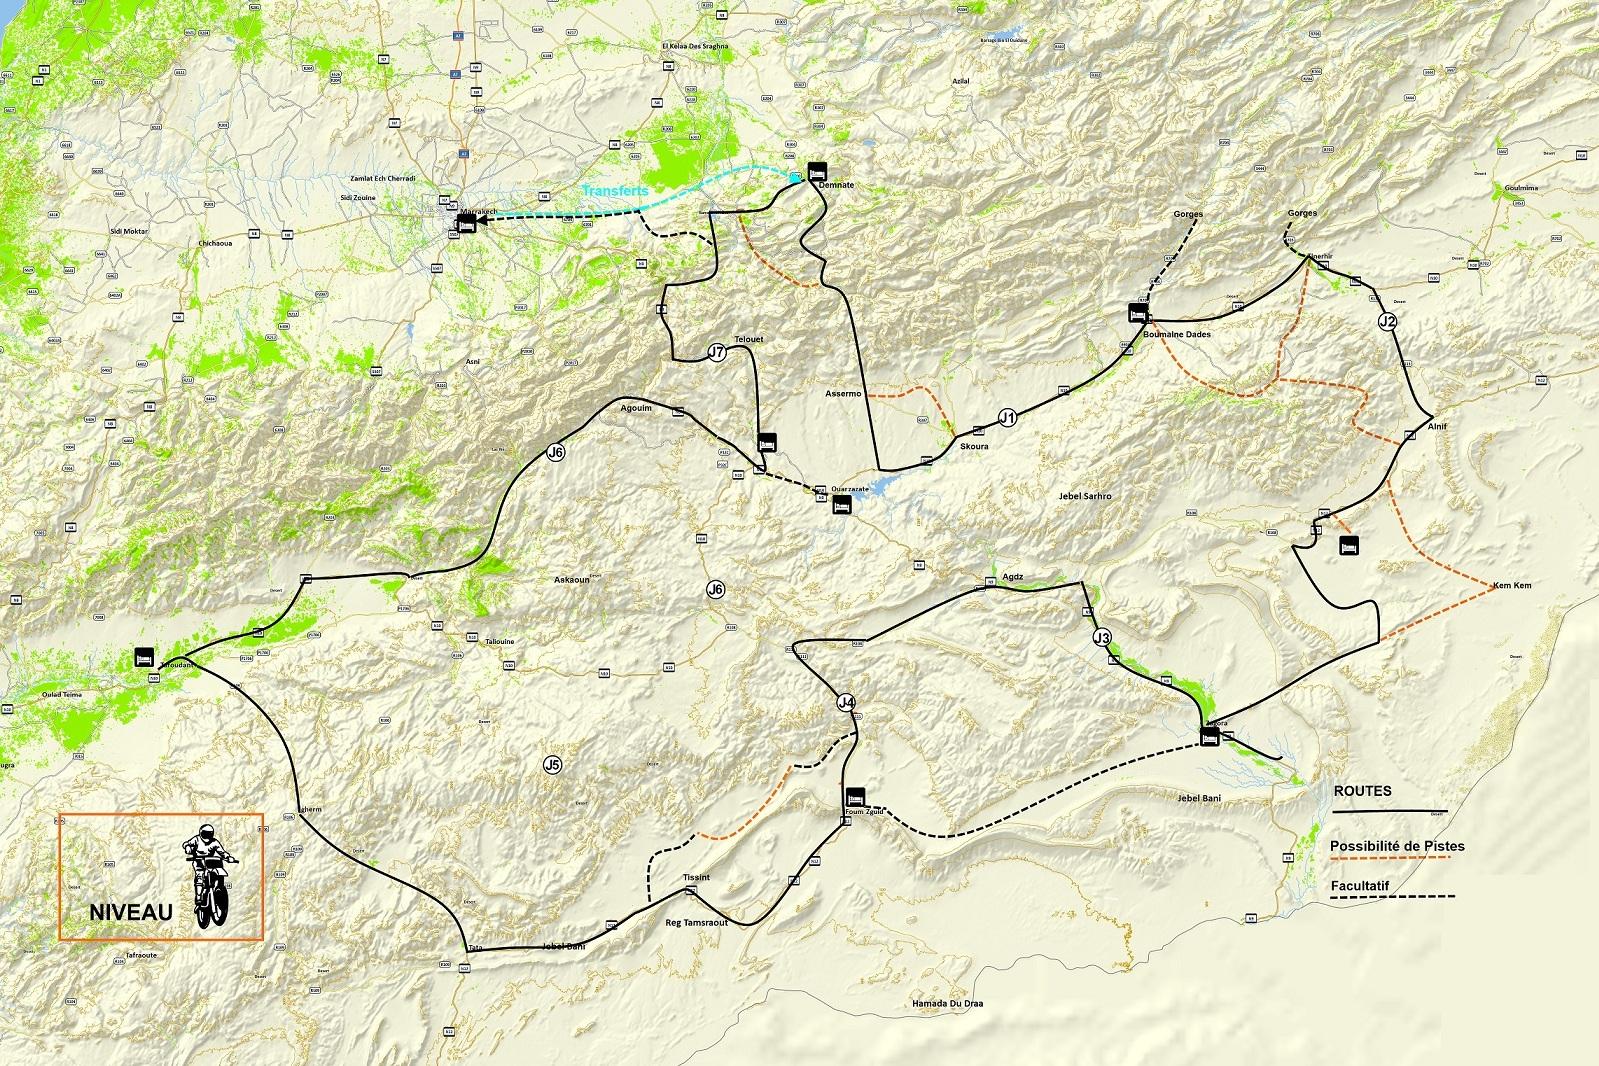 Haut Atlas et vallée du Draa à Moto